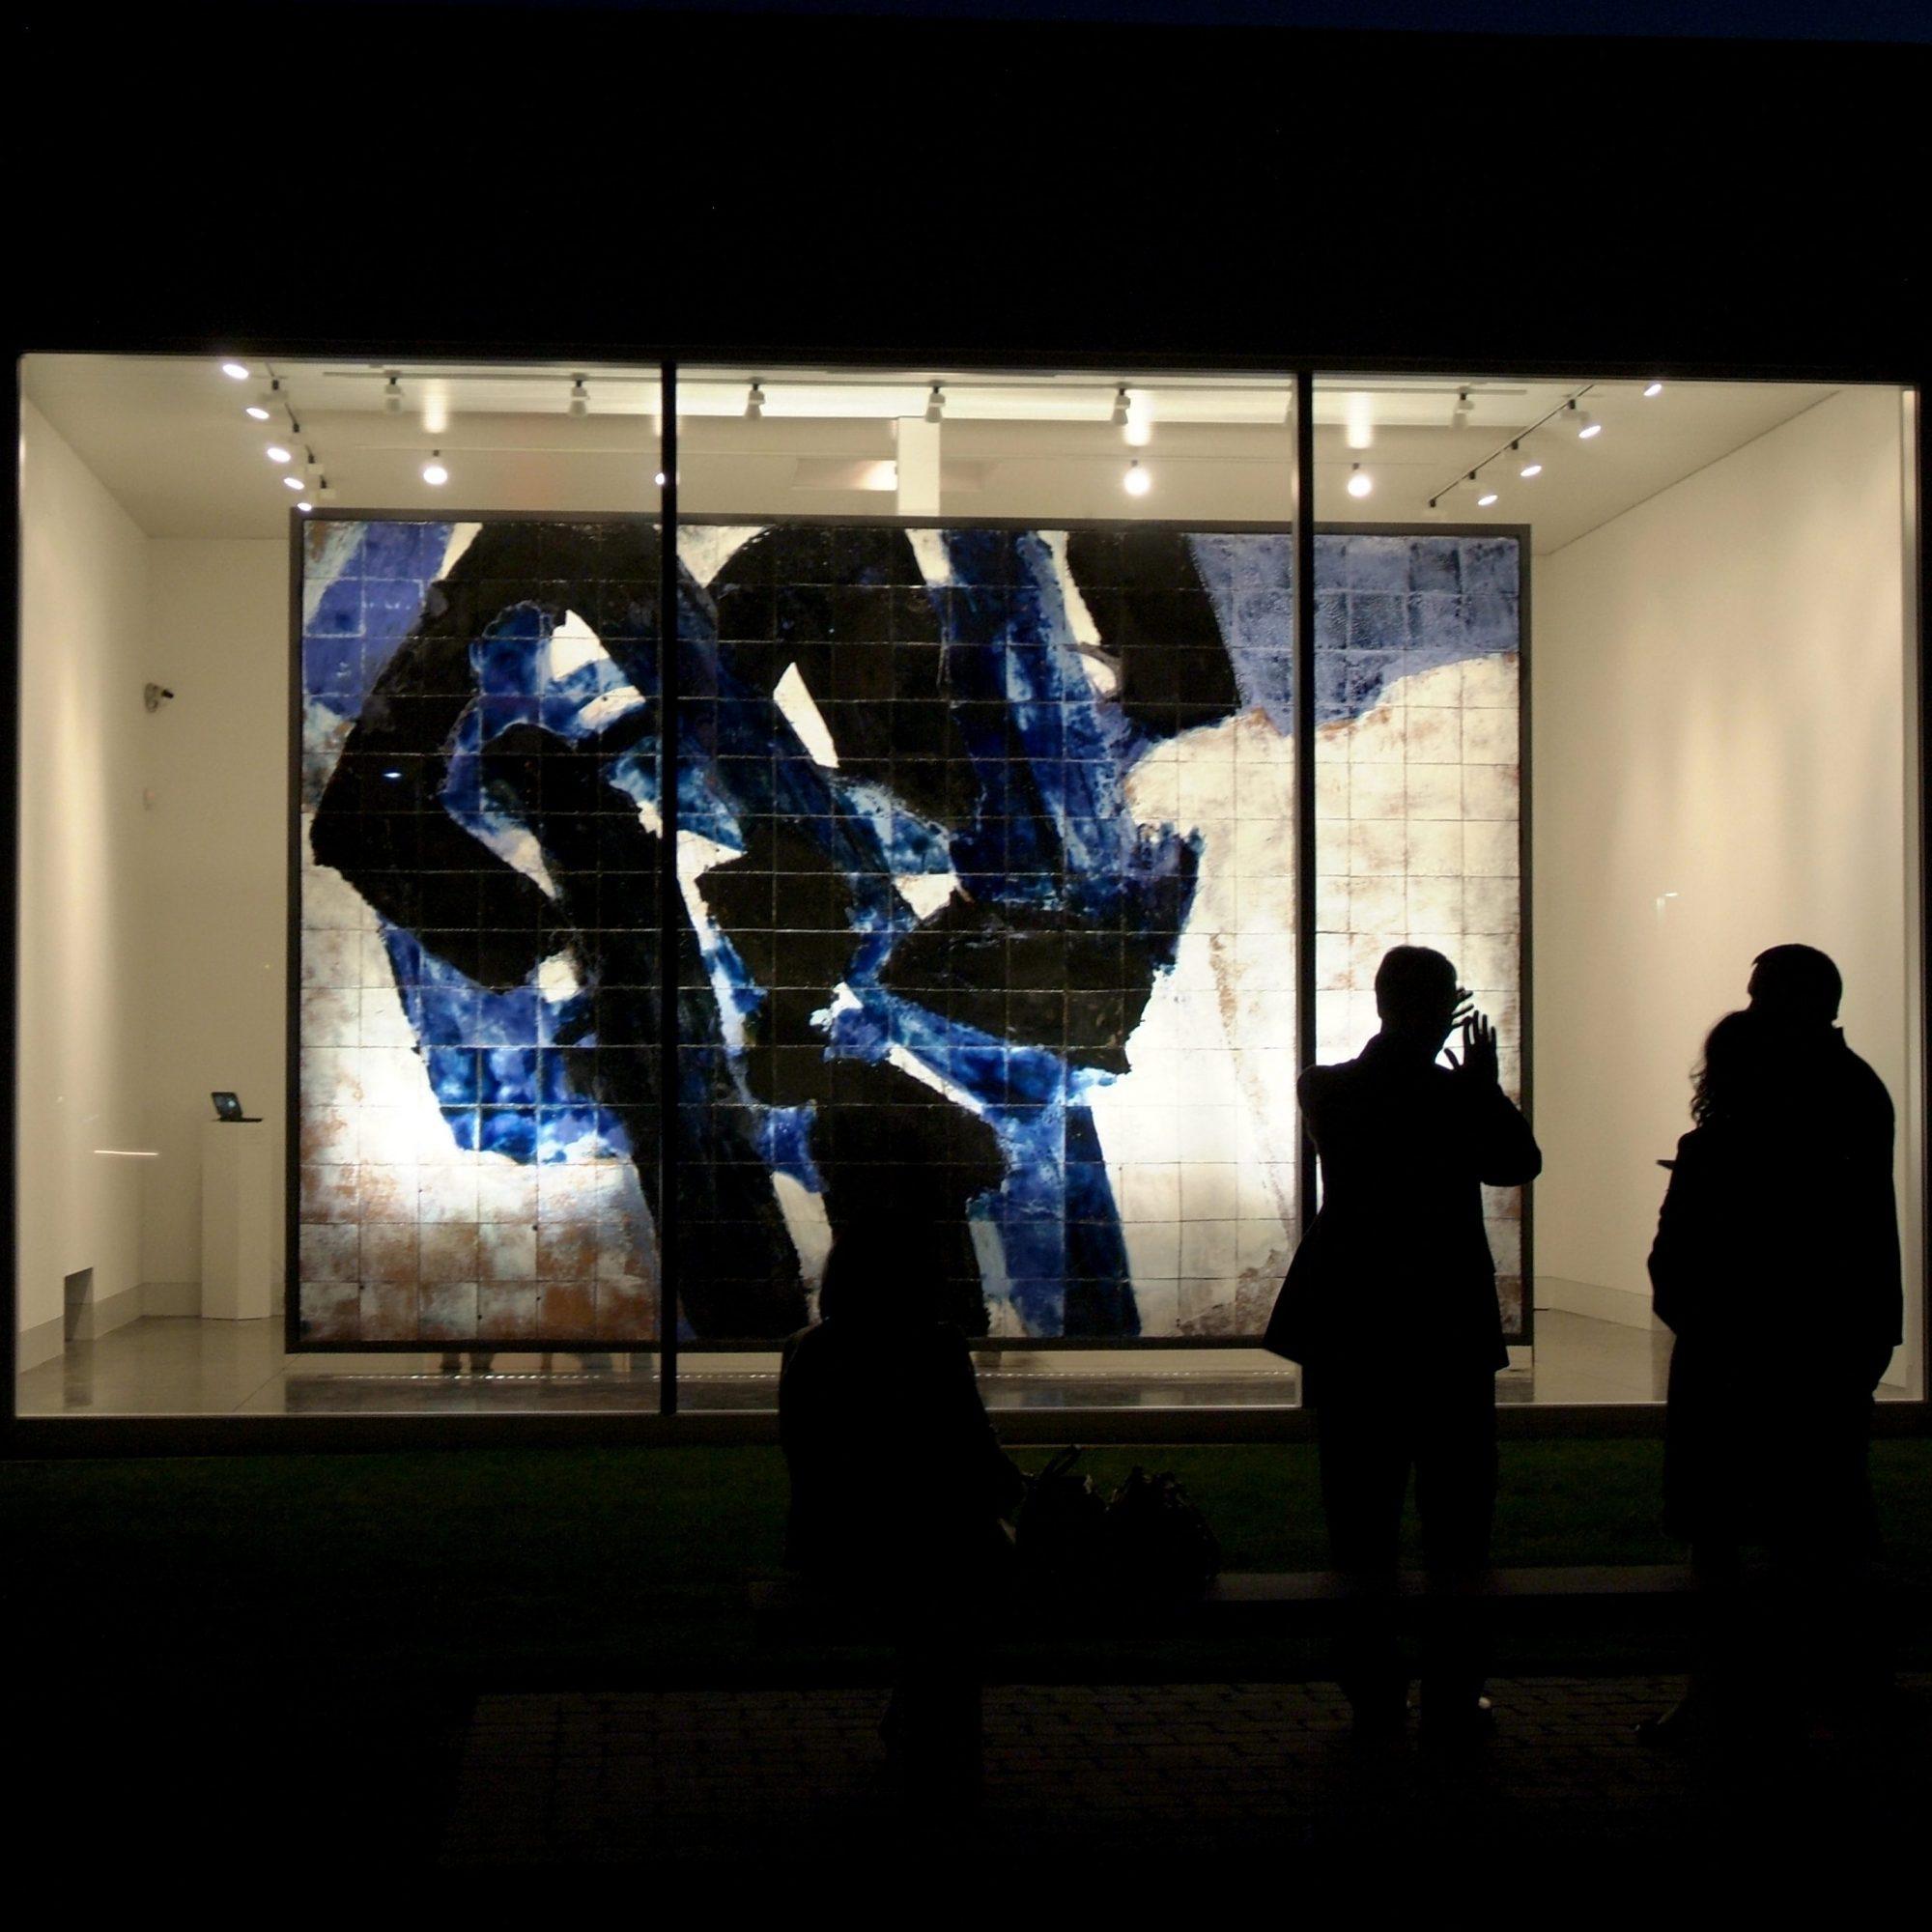 night image of a ceramic installation